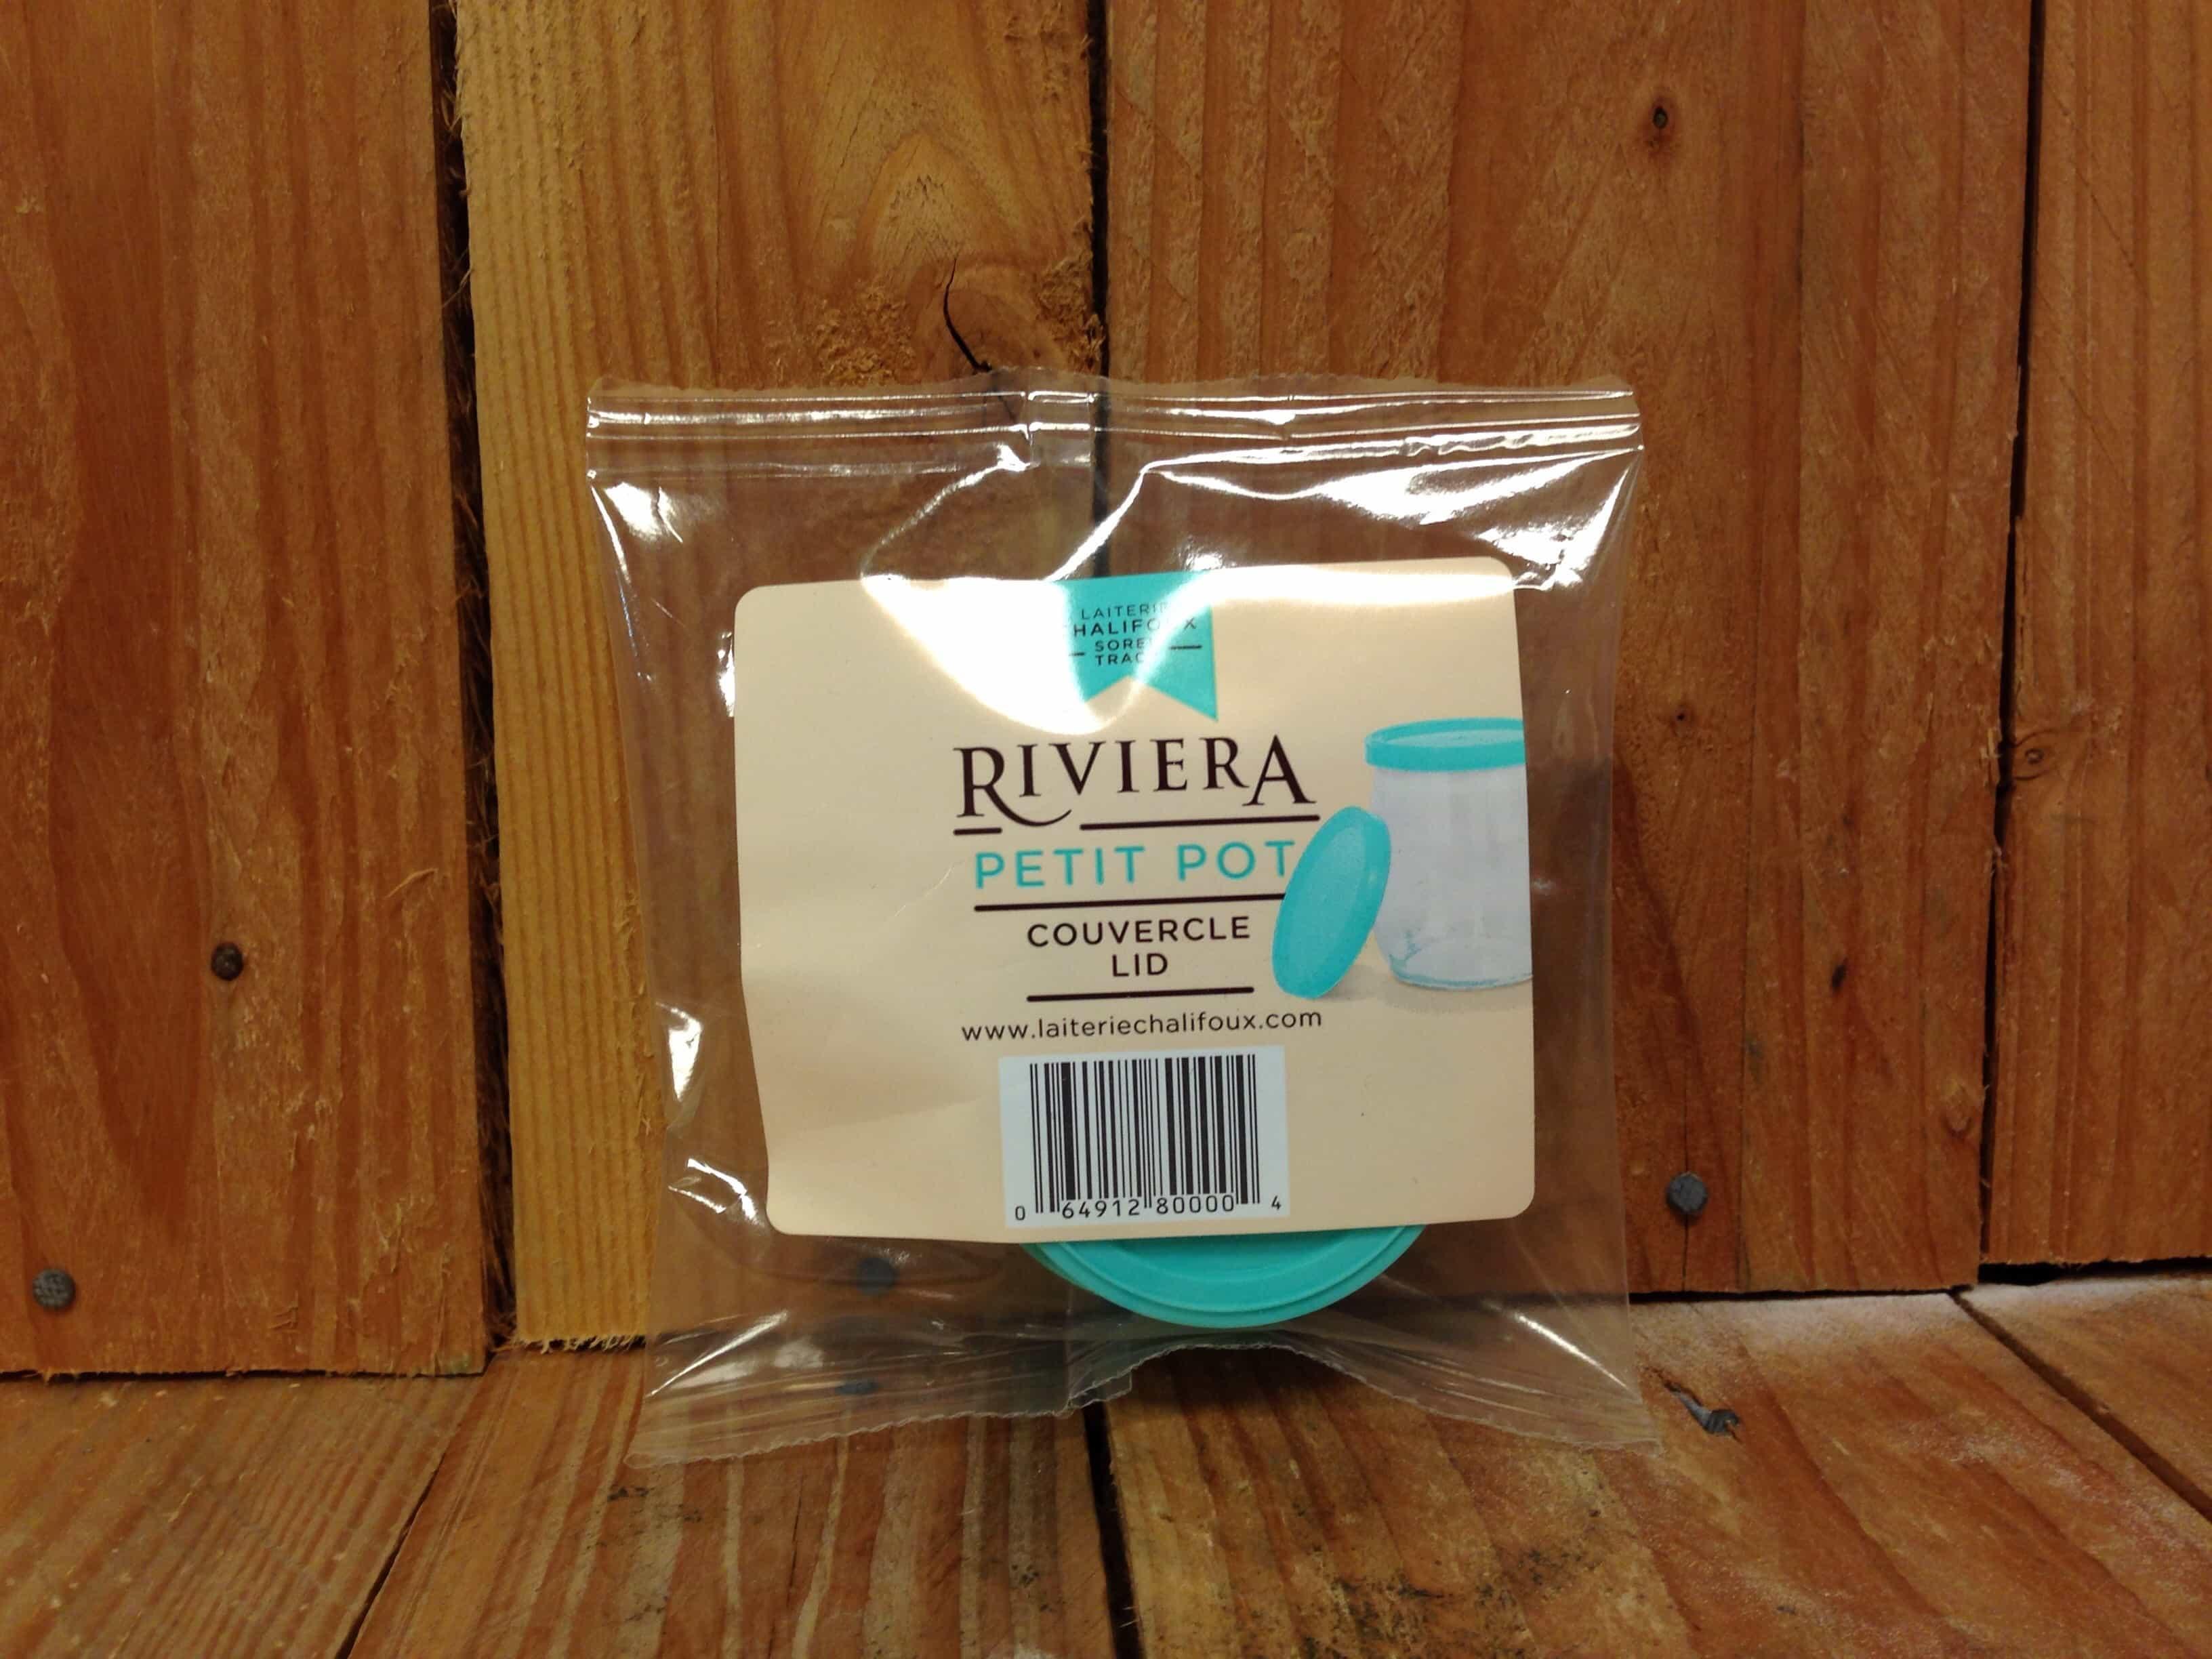 Riviera Yogurt – Petit Pot Resuable Lids (Pack of 4)